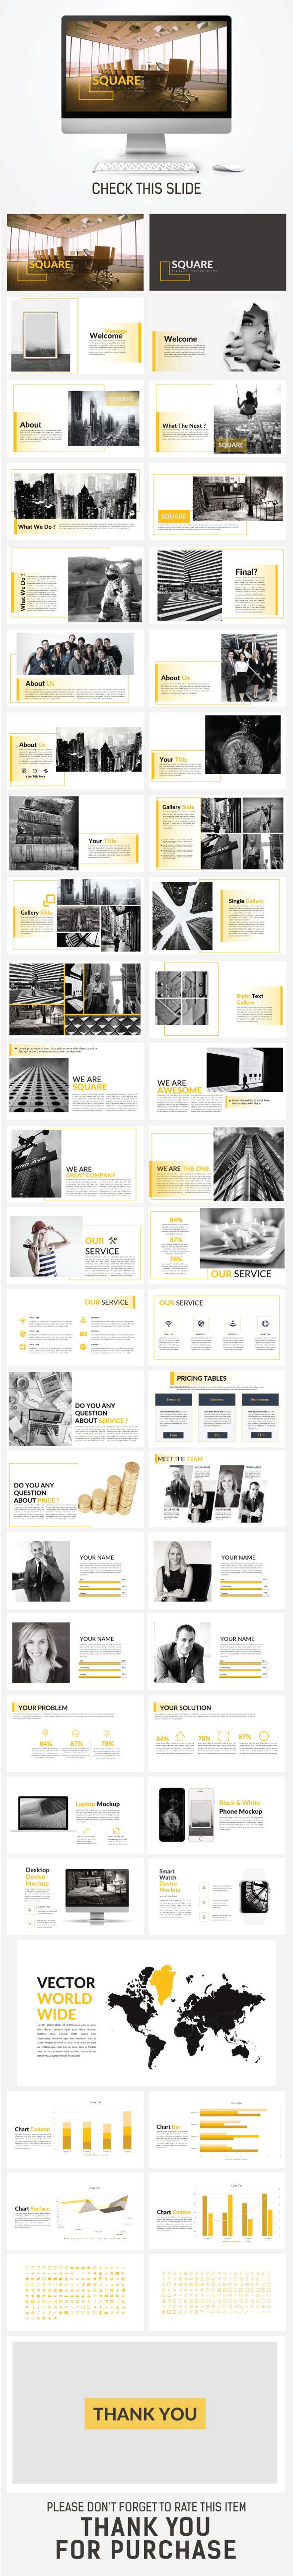 Square Keynote Presentation - Business Keynote Templates